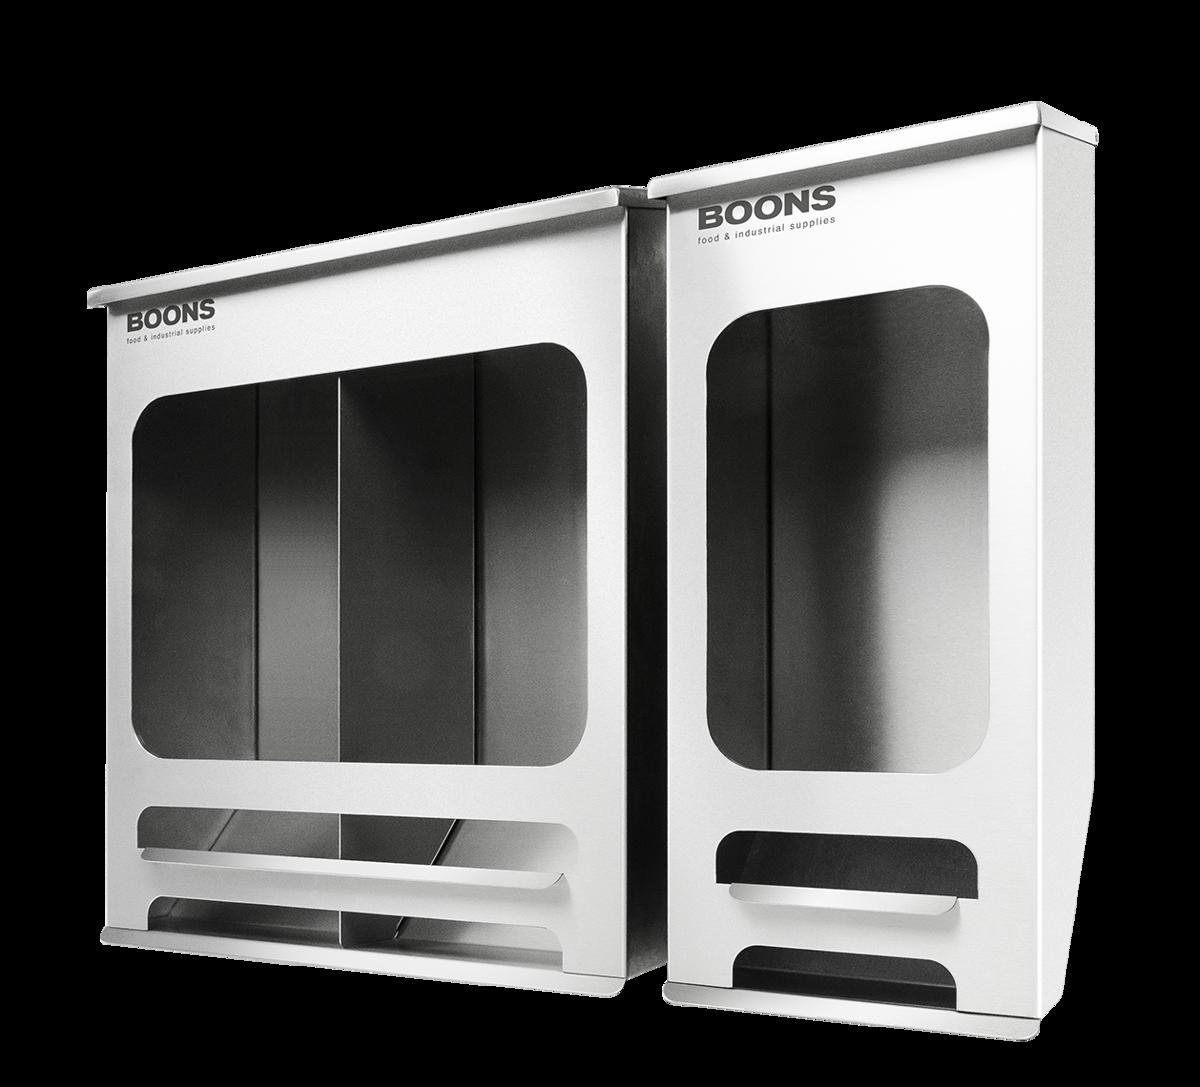 RVS<br>universele dispensers<br>UD‑WGL en UD‑WGM